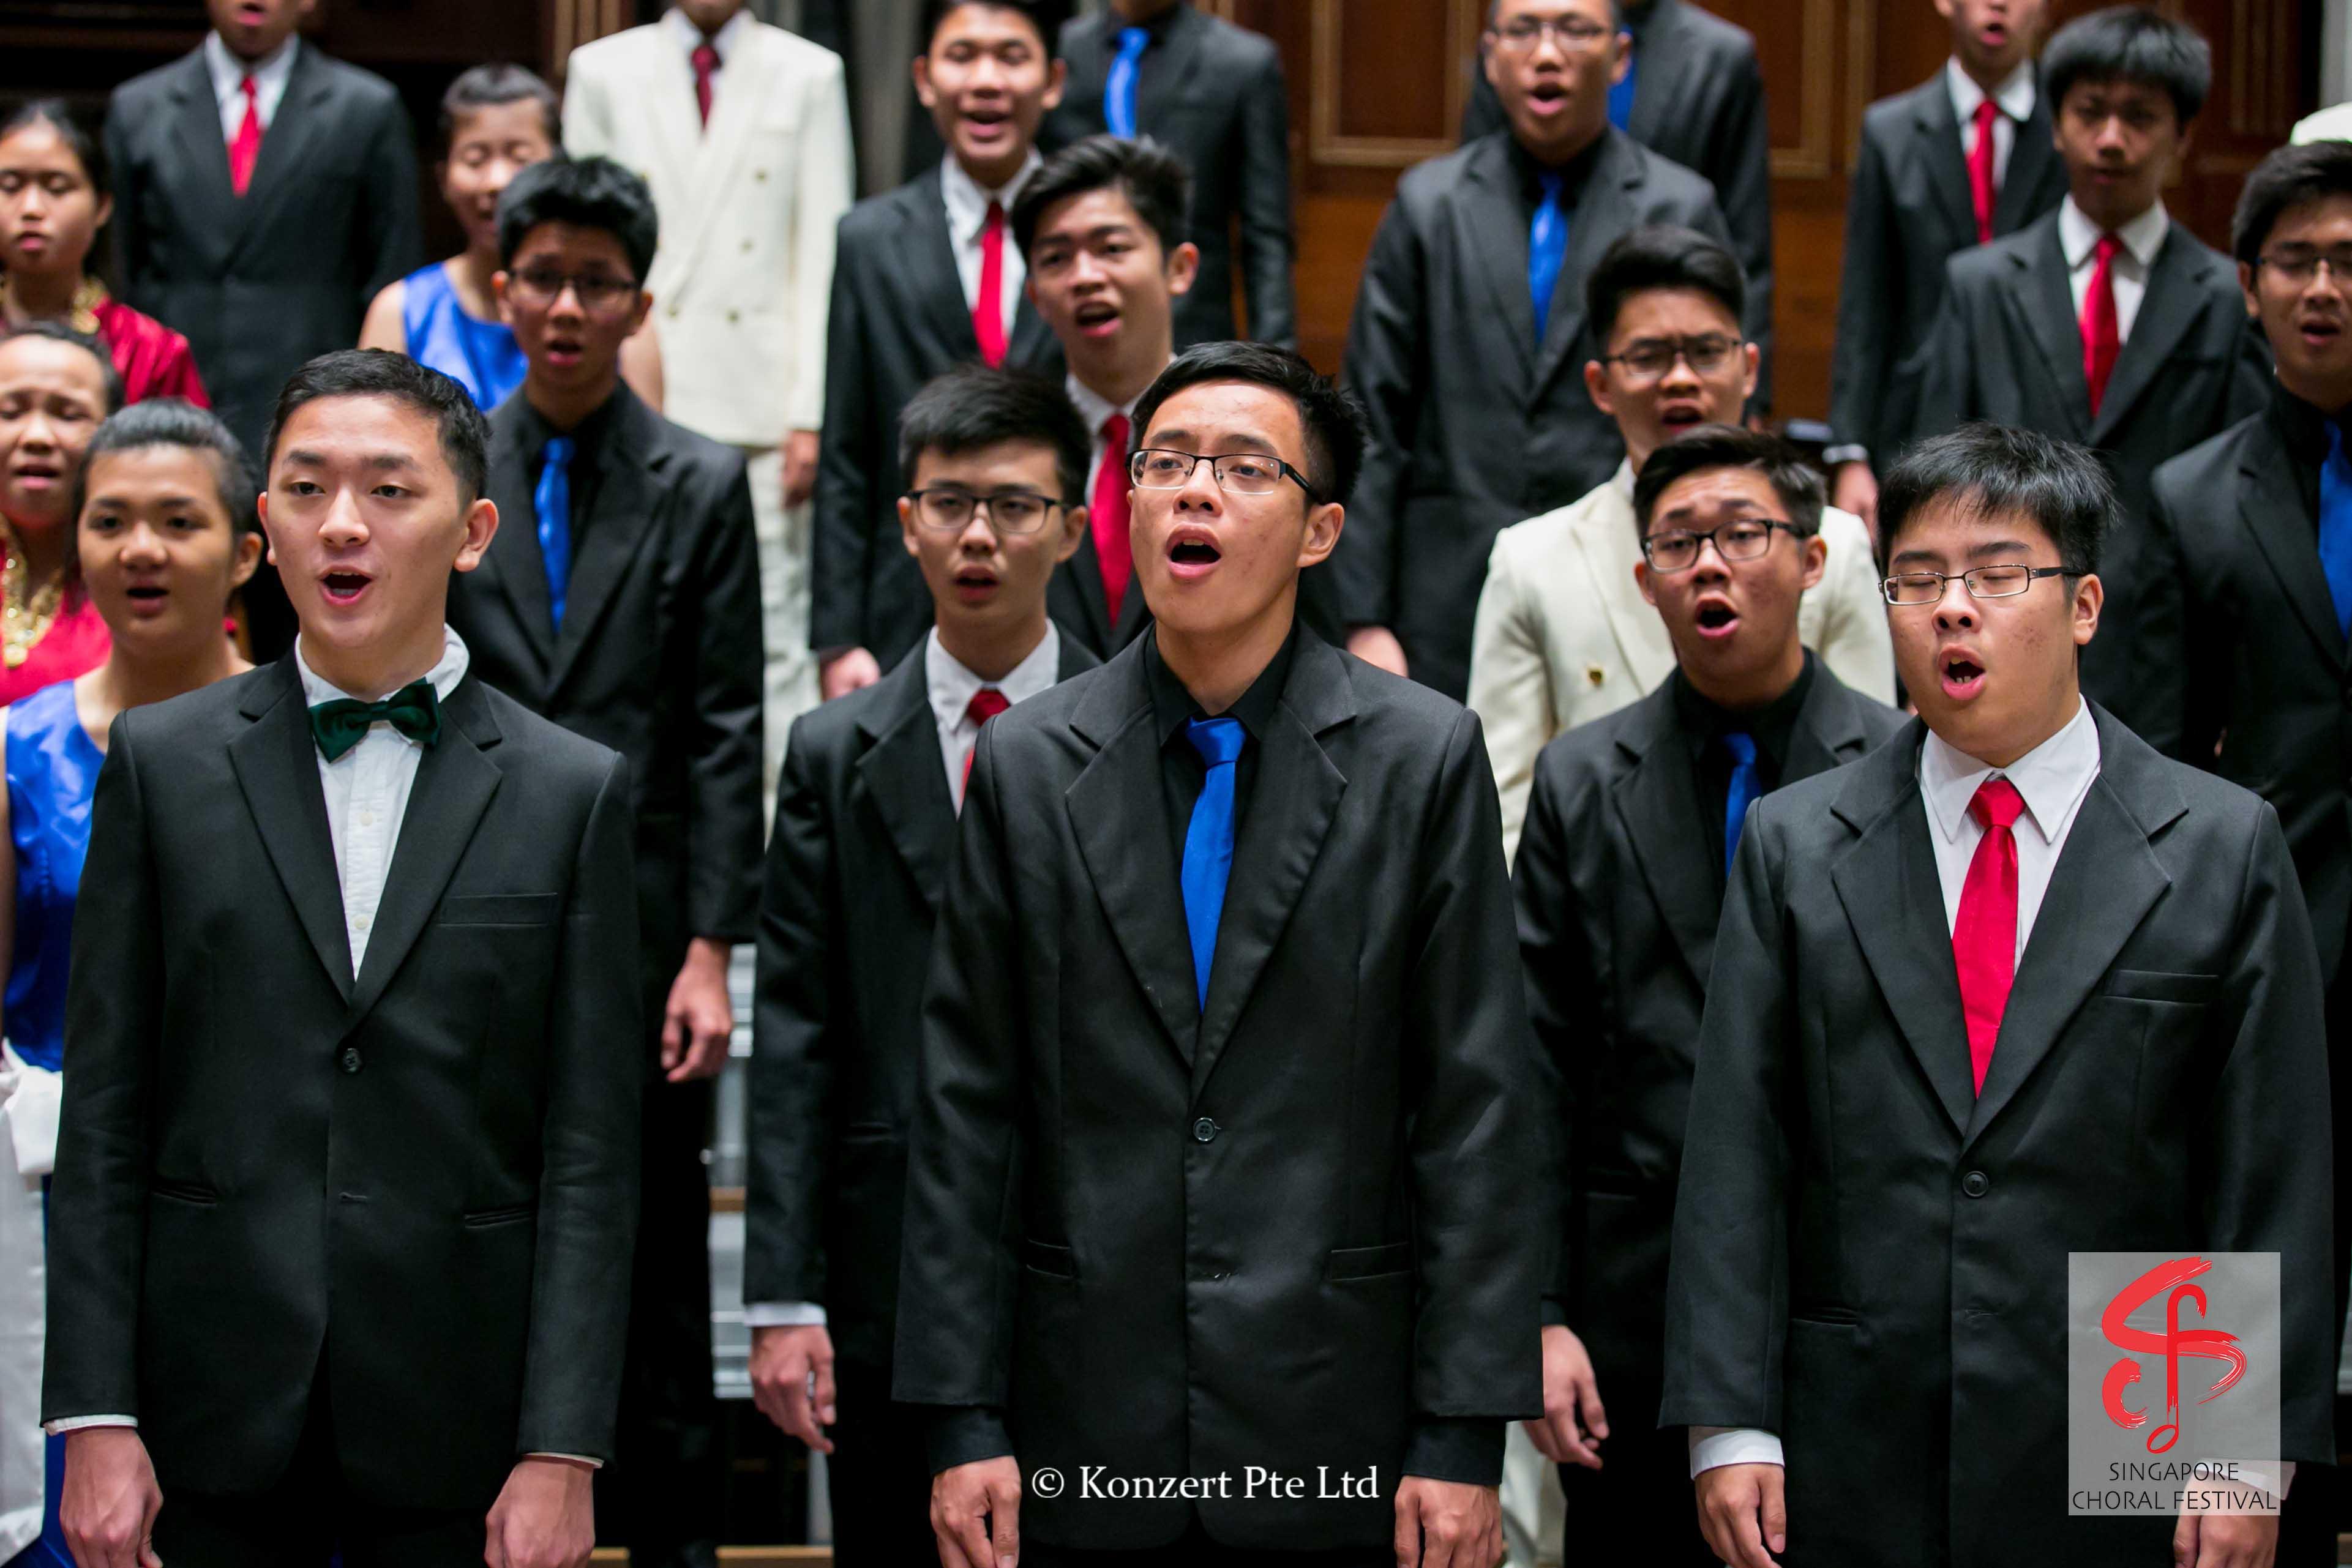 Singapore Choral Festival 7-8-15 (133).jpg